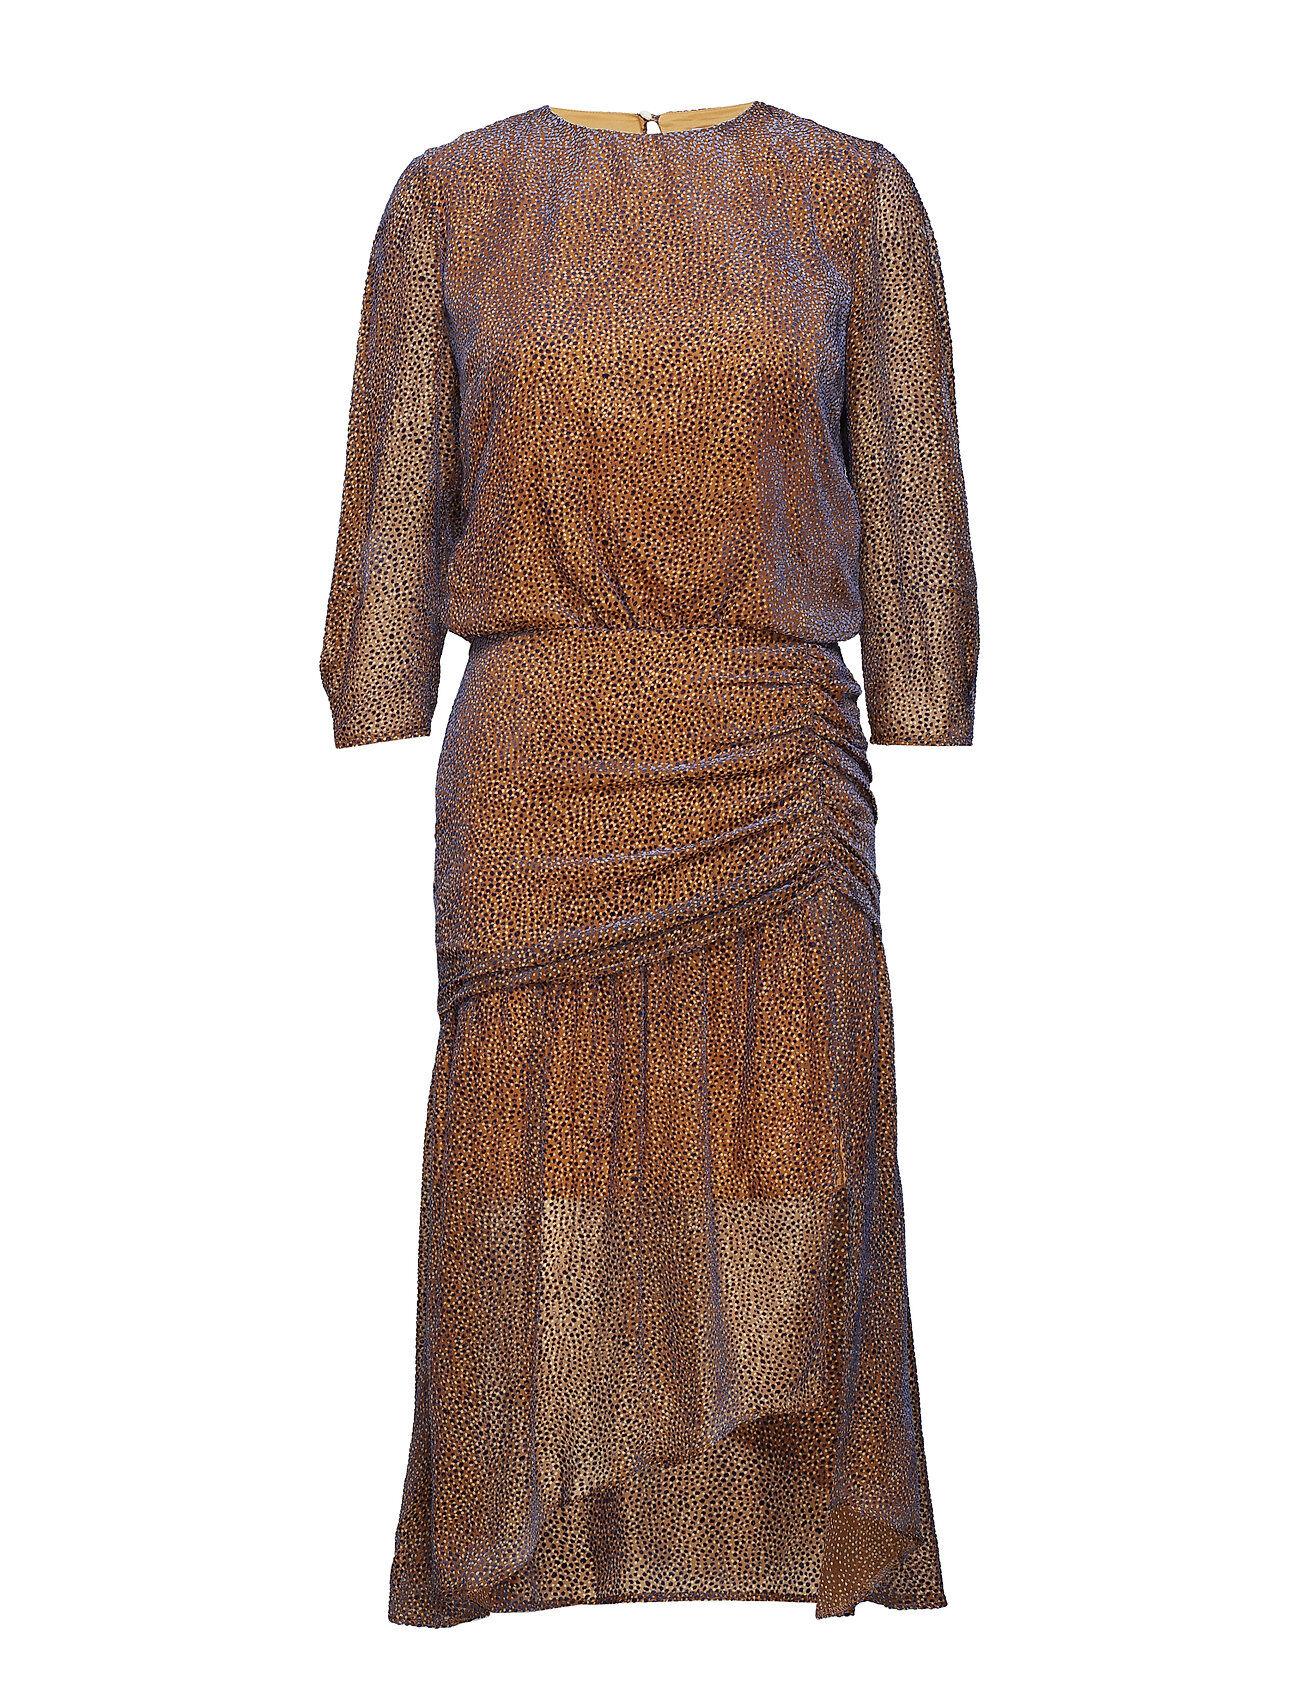 Valerie Bashi Dress